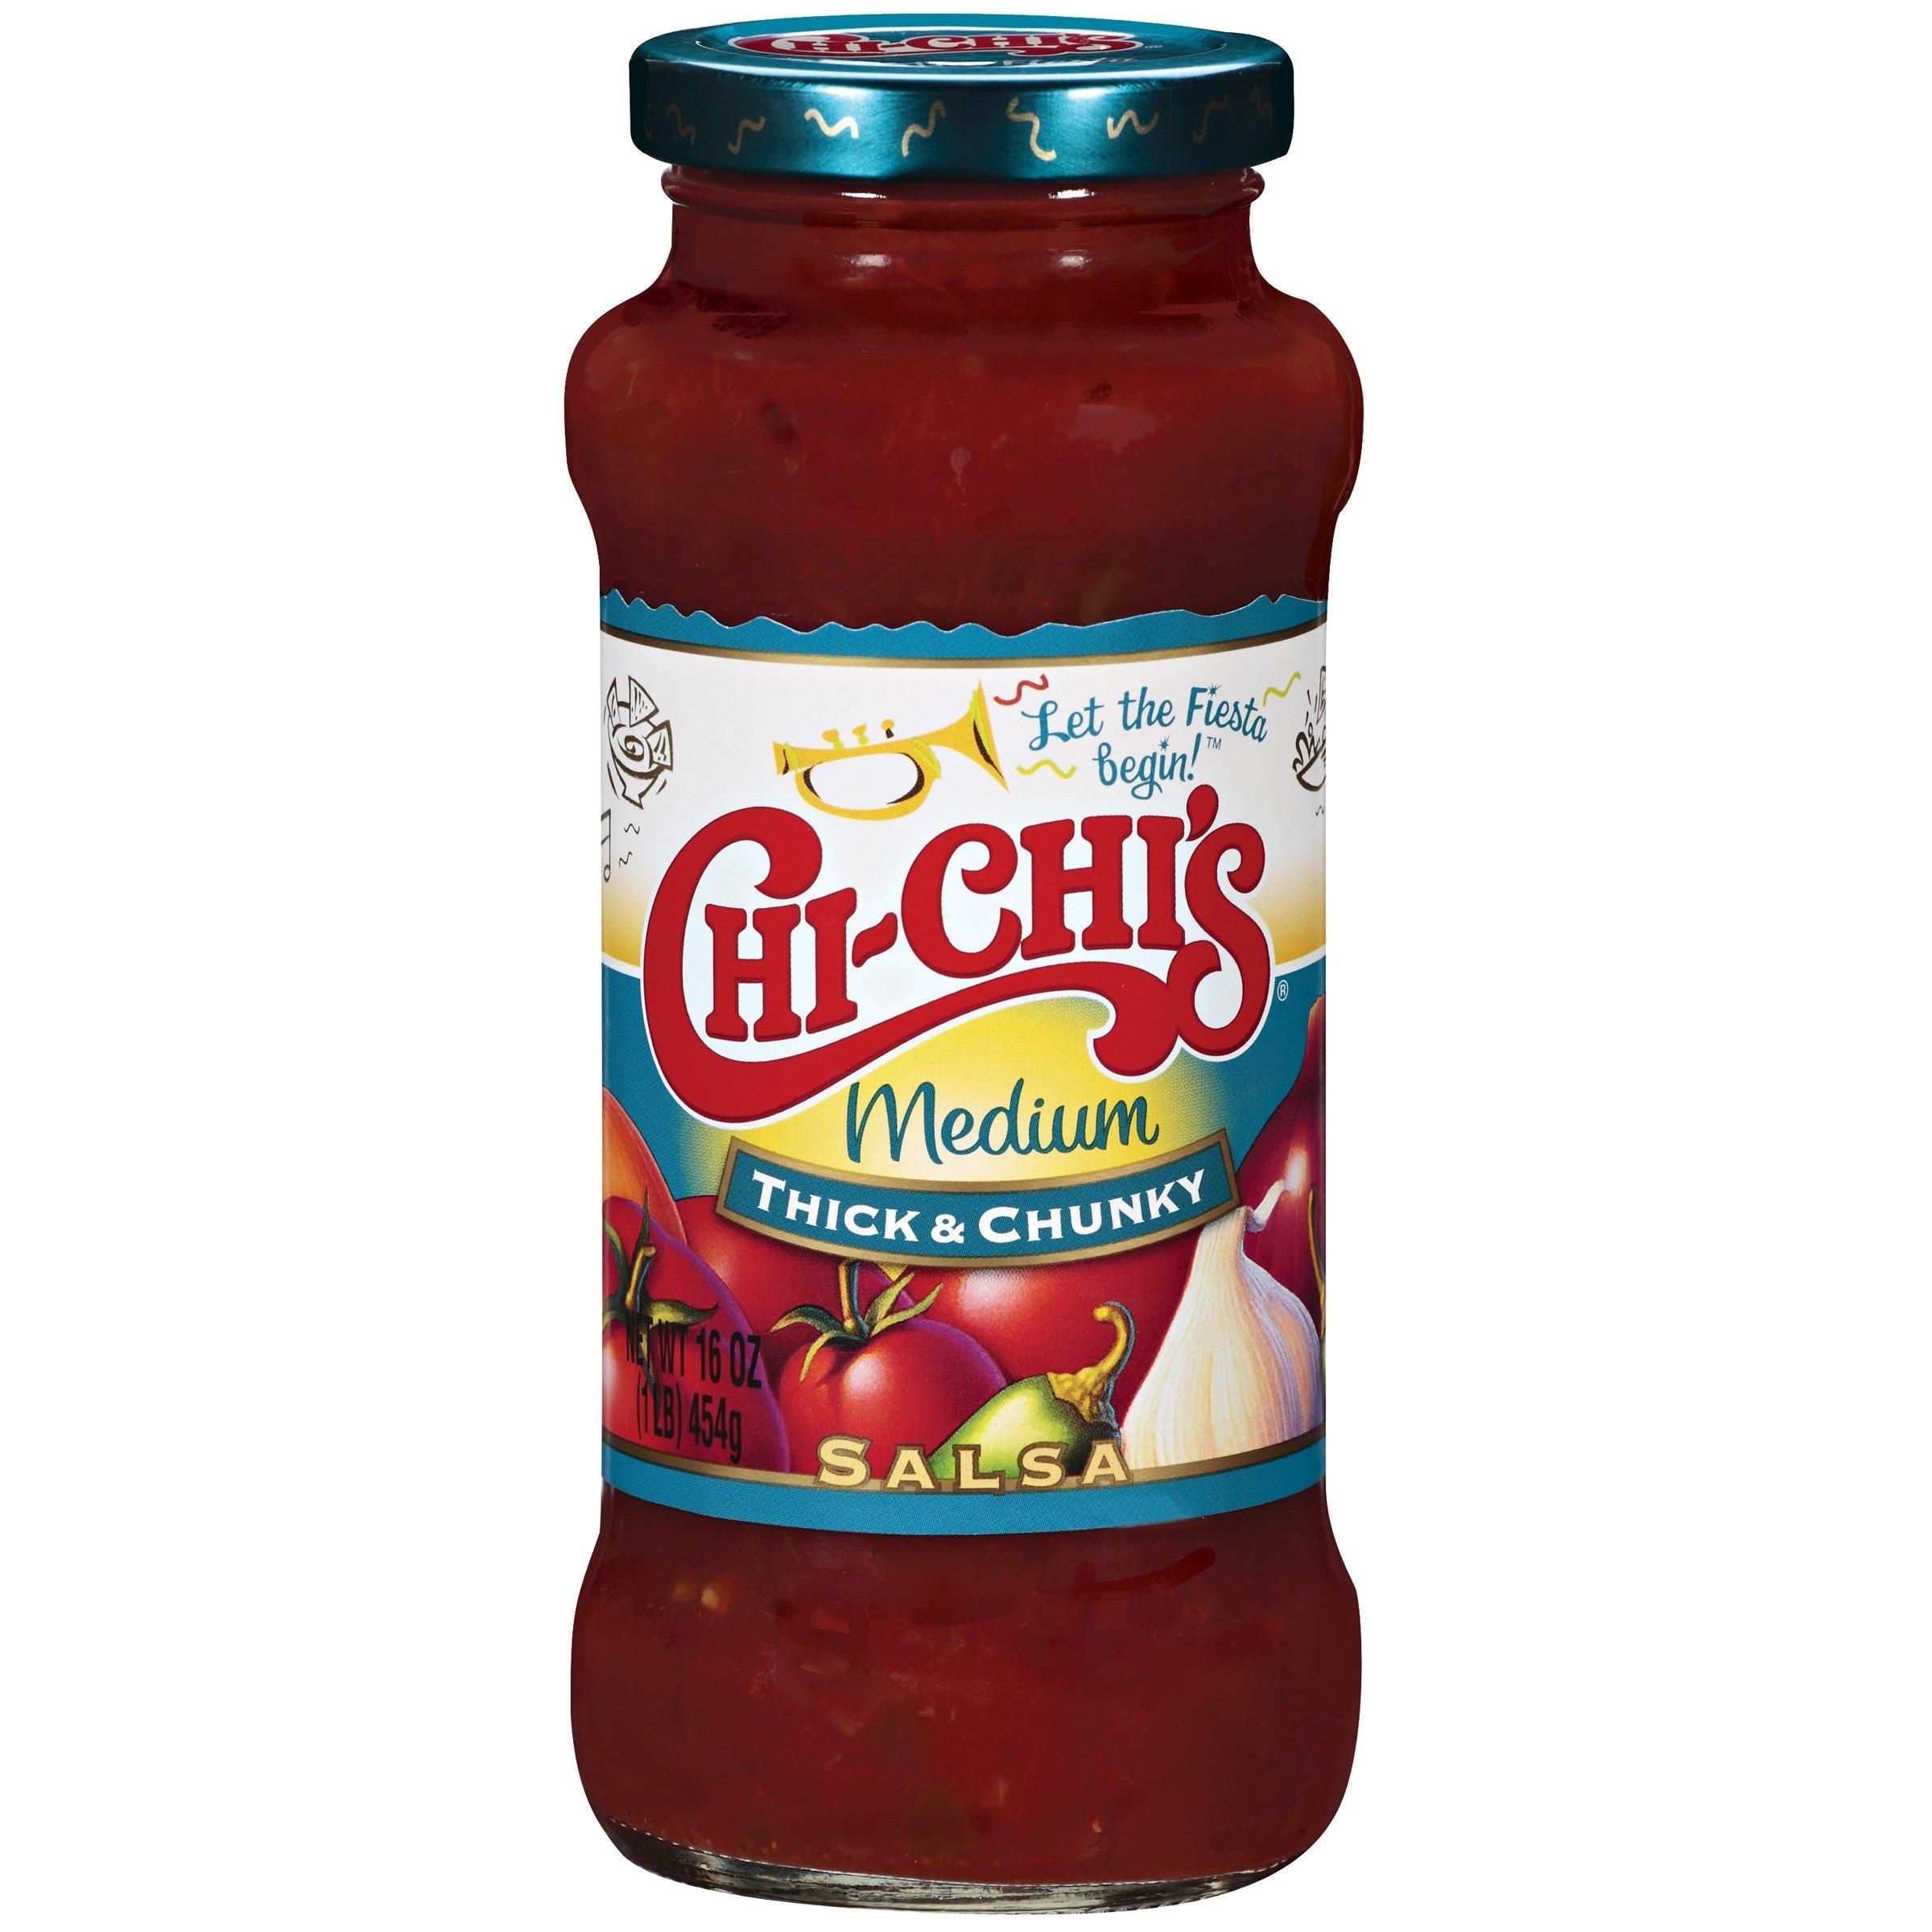 Chi-Chi's Salsa Thick & Chunky Medium 16 OZ (Pack of 24)